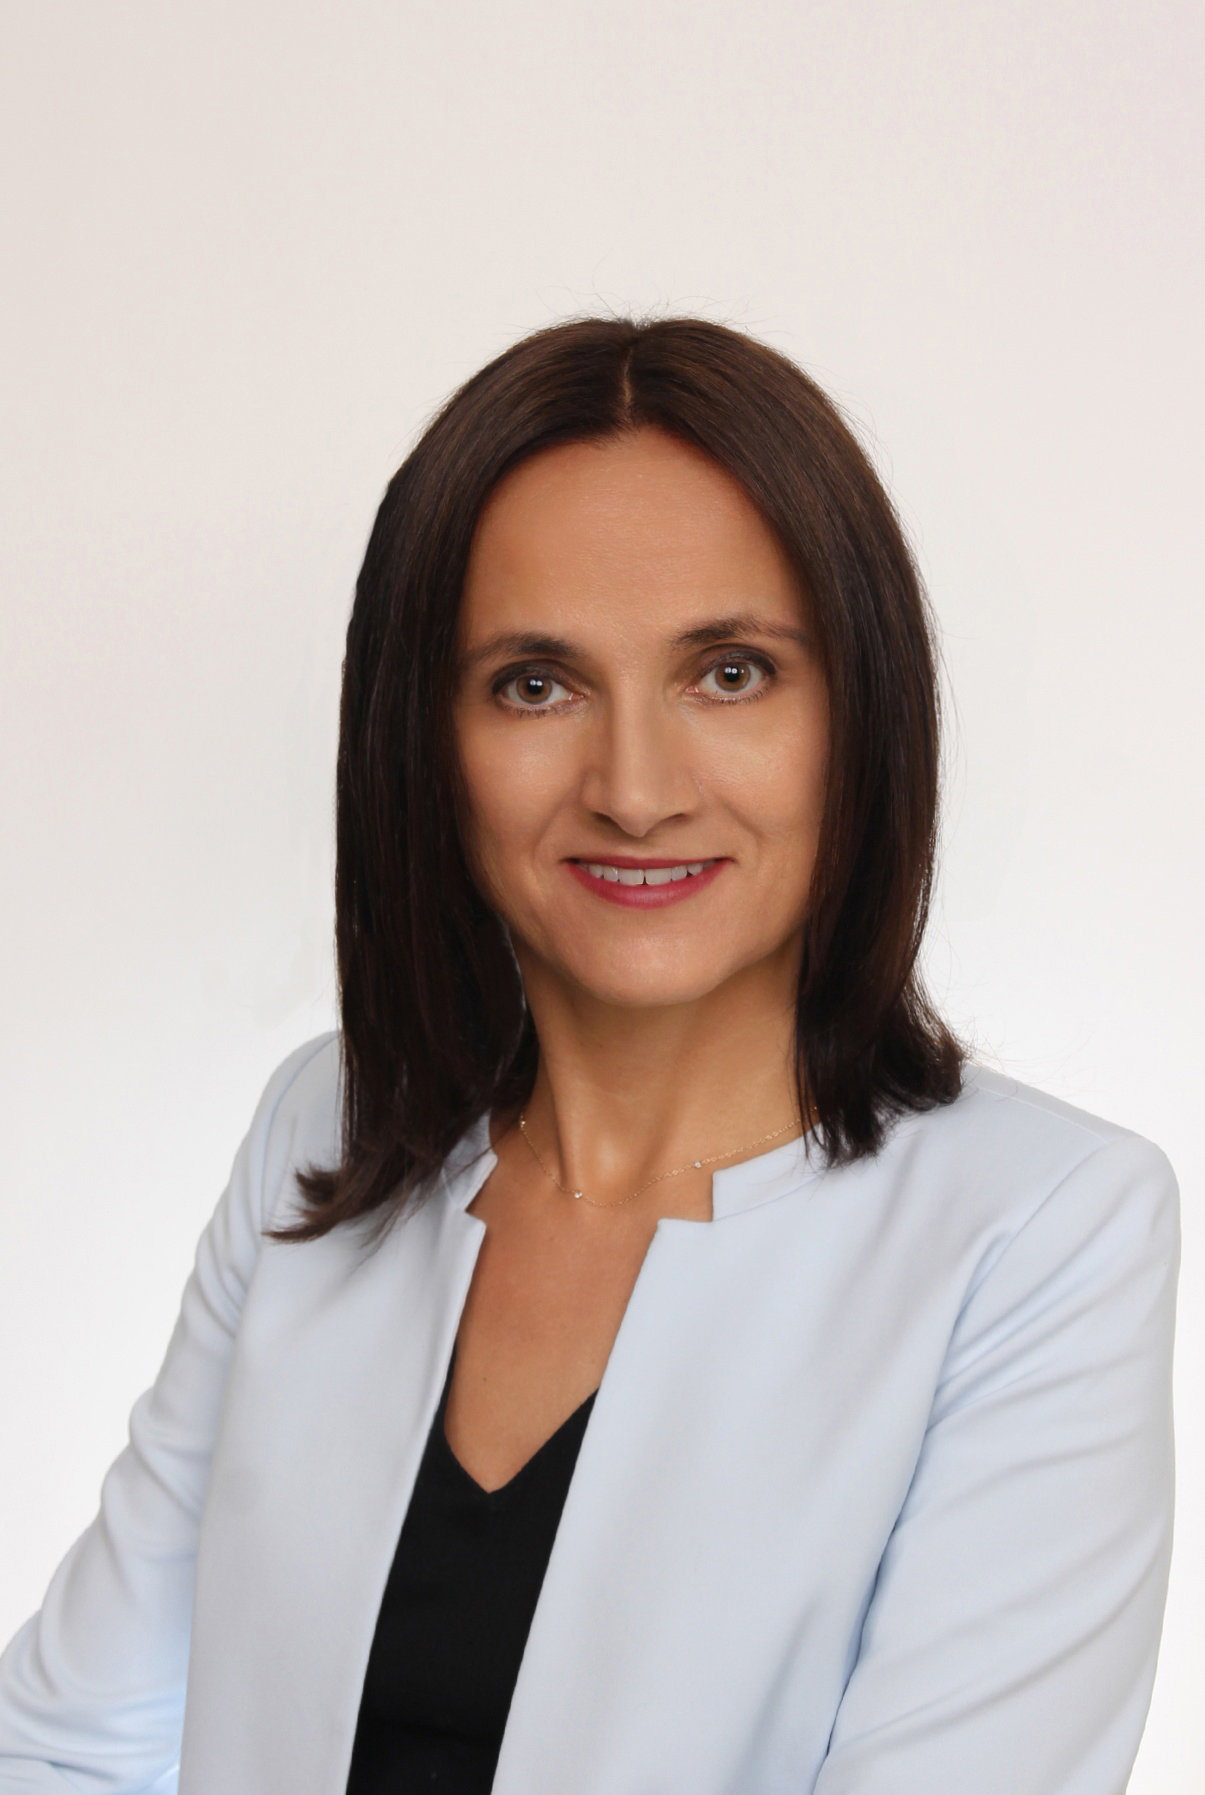 dr hab. Iwona Sadowska-Krawczenko